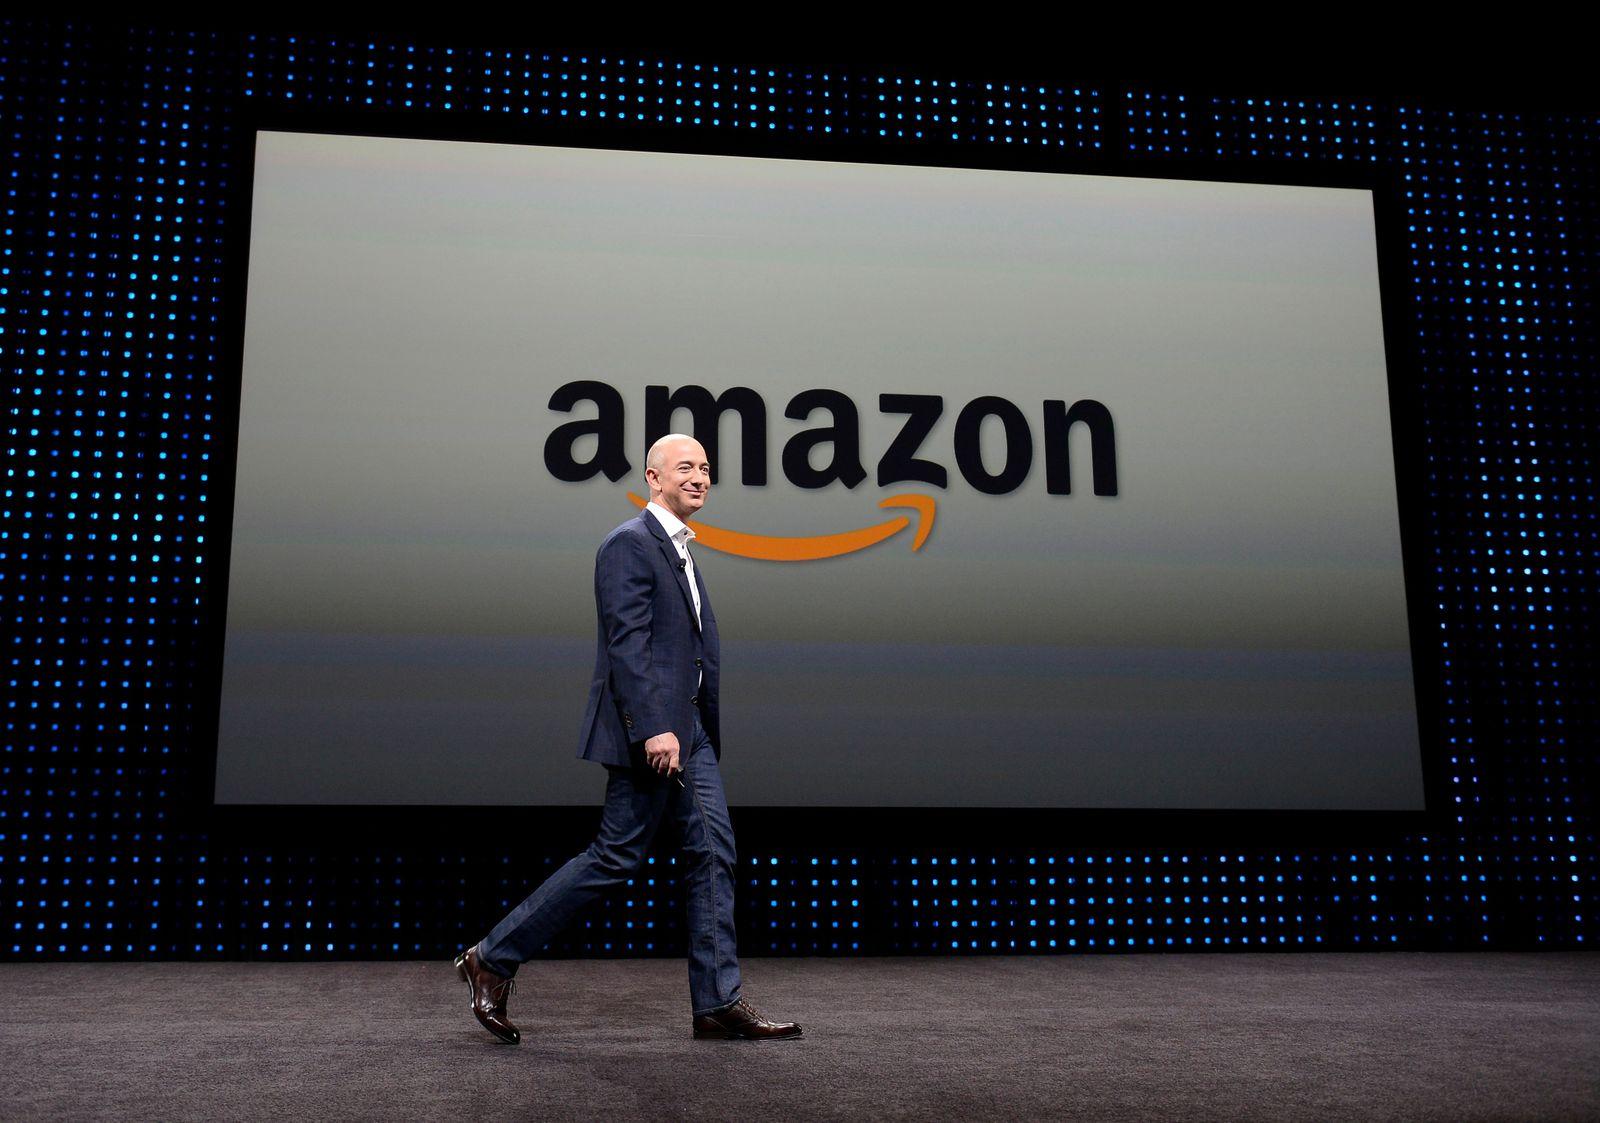 Jeff Bezos will step down as Amazon CEO by Q3, Santa Monica, USA - 14 Jun 2012